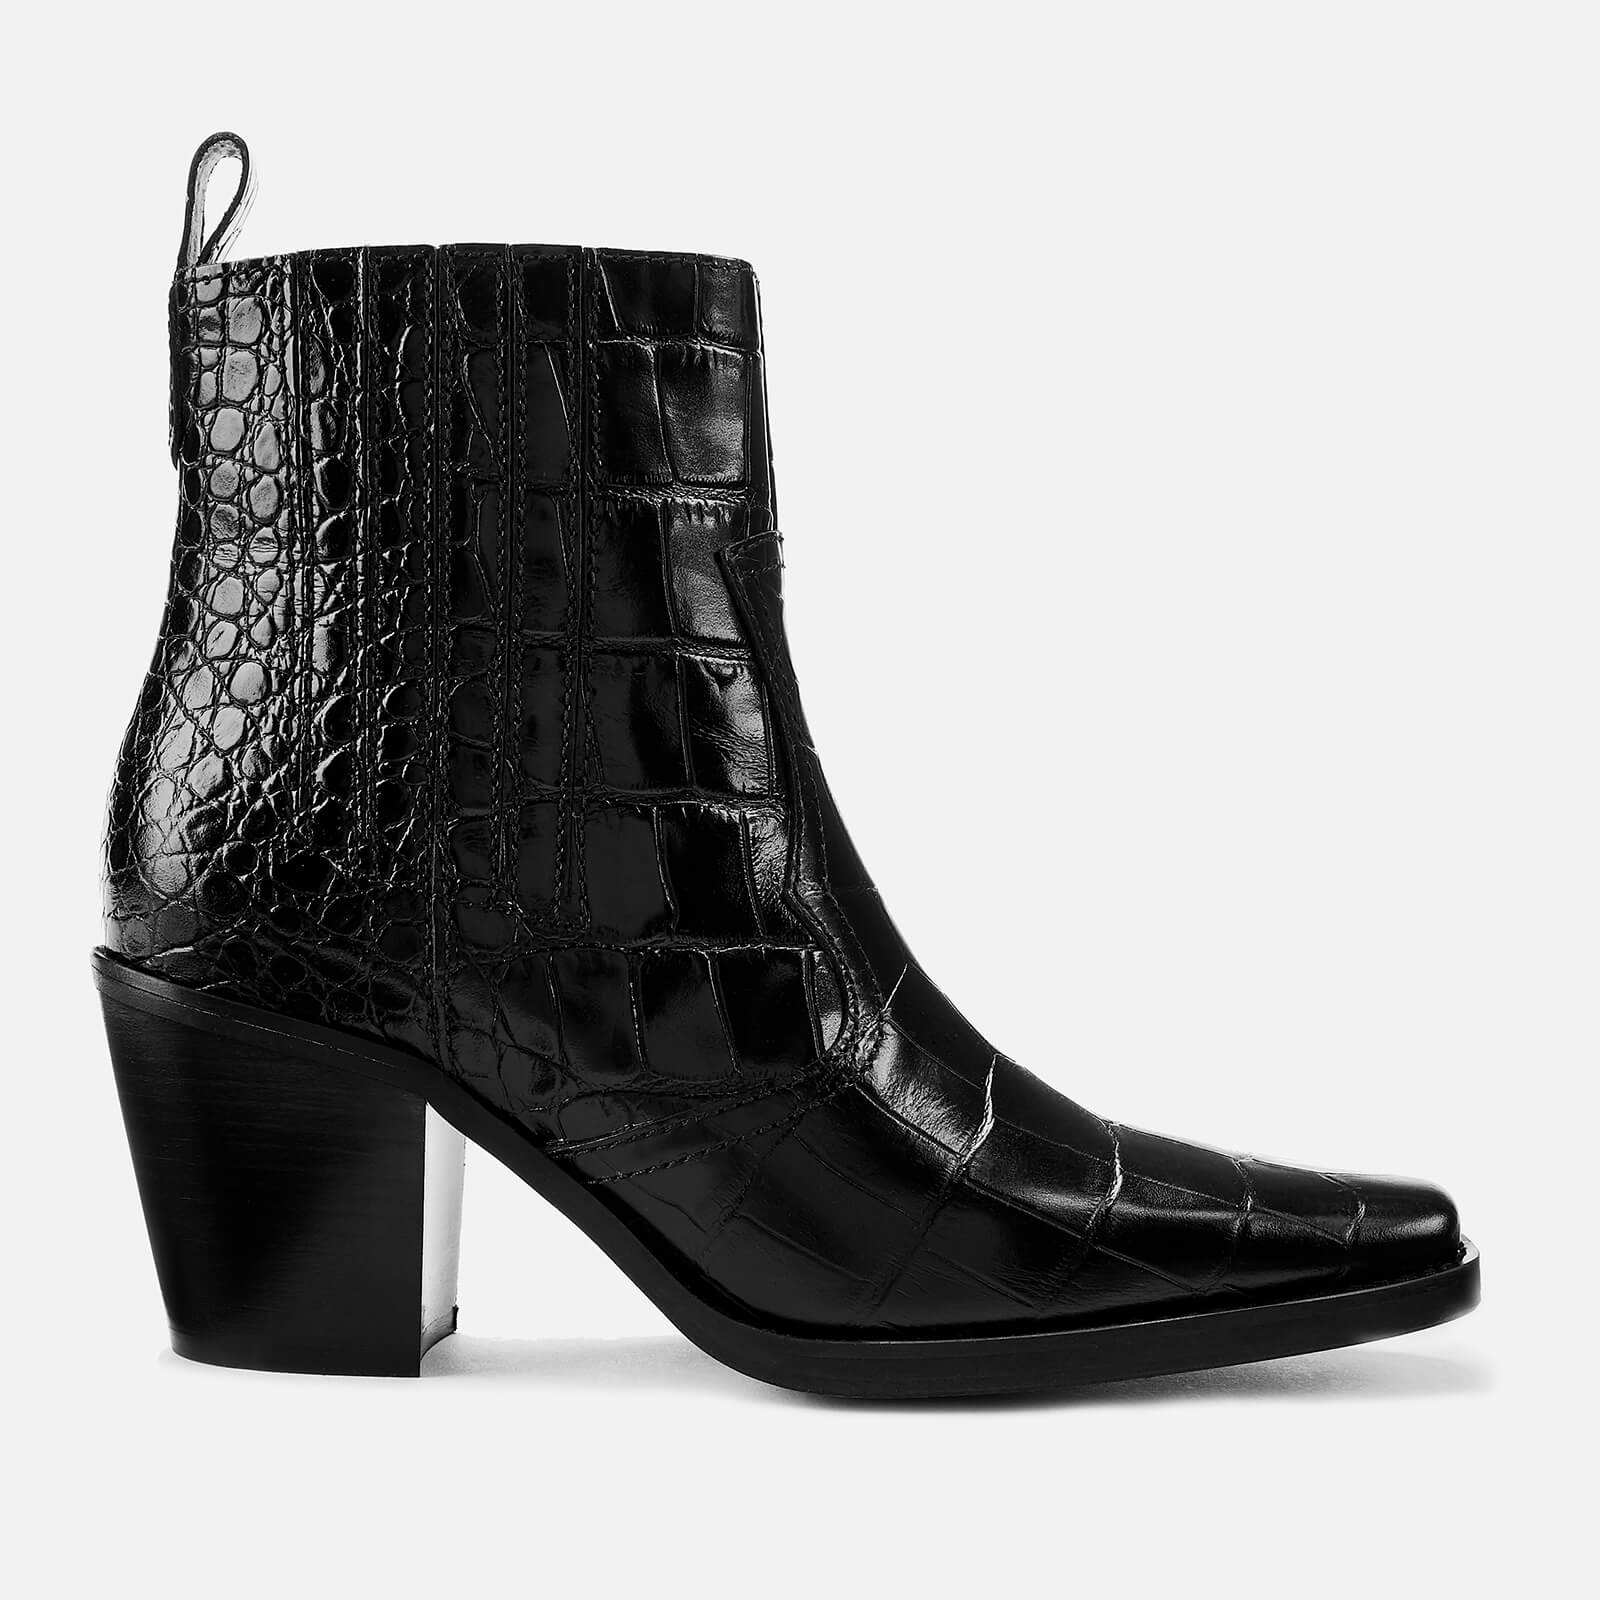 c1218ca45 Ganni Women s Western Boots - Black Ganni Women s Western Boots - Black